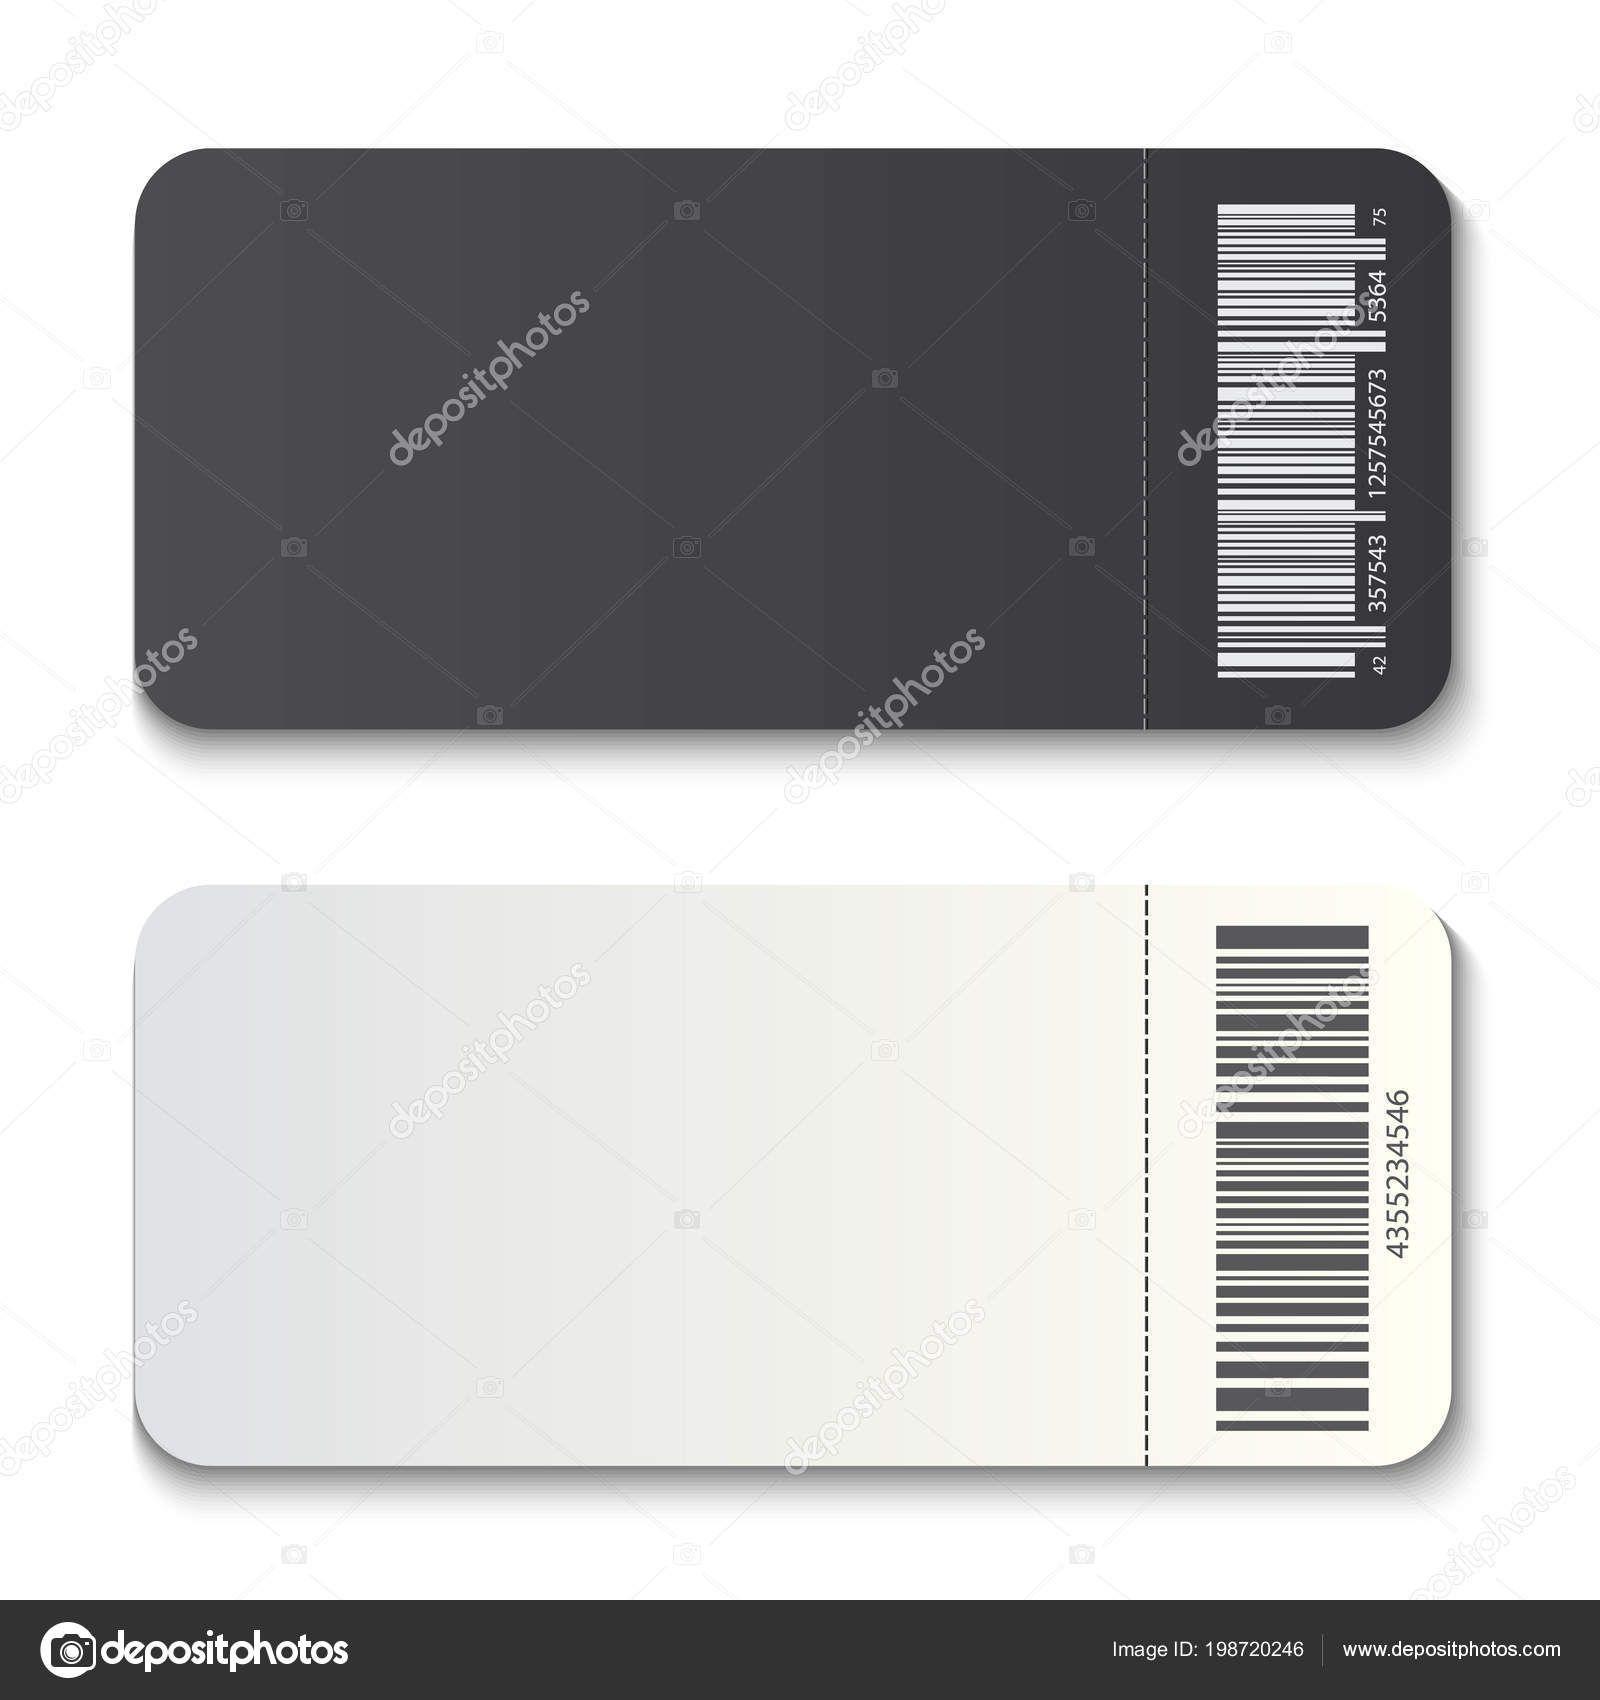 The Marvellous Creative Vector Illustration Of Empty Ticket Template Mockup Regarding B Ticket Template Free Business Card Templates Business Card Template Psd